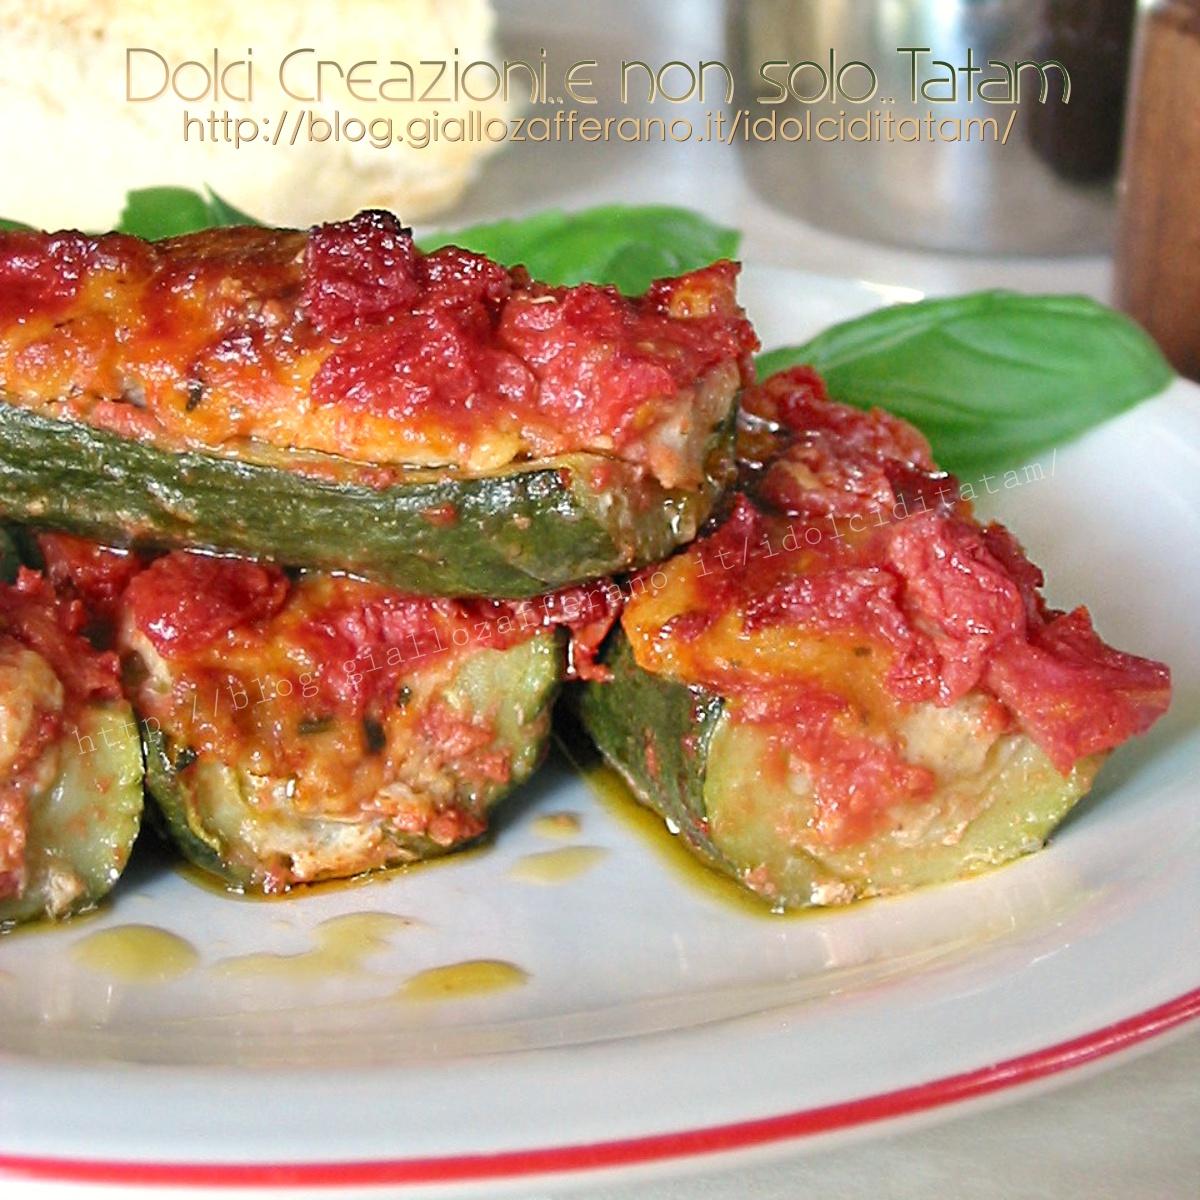 Ricetta Zucchine Ripiene Di Carne Al Sugo.Zucchine Ripiene Di Carne Al Pomodoro Ricetta Facile